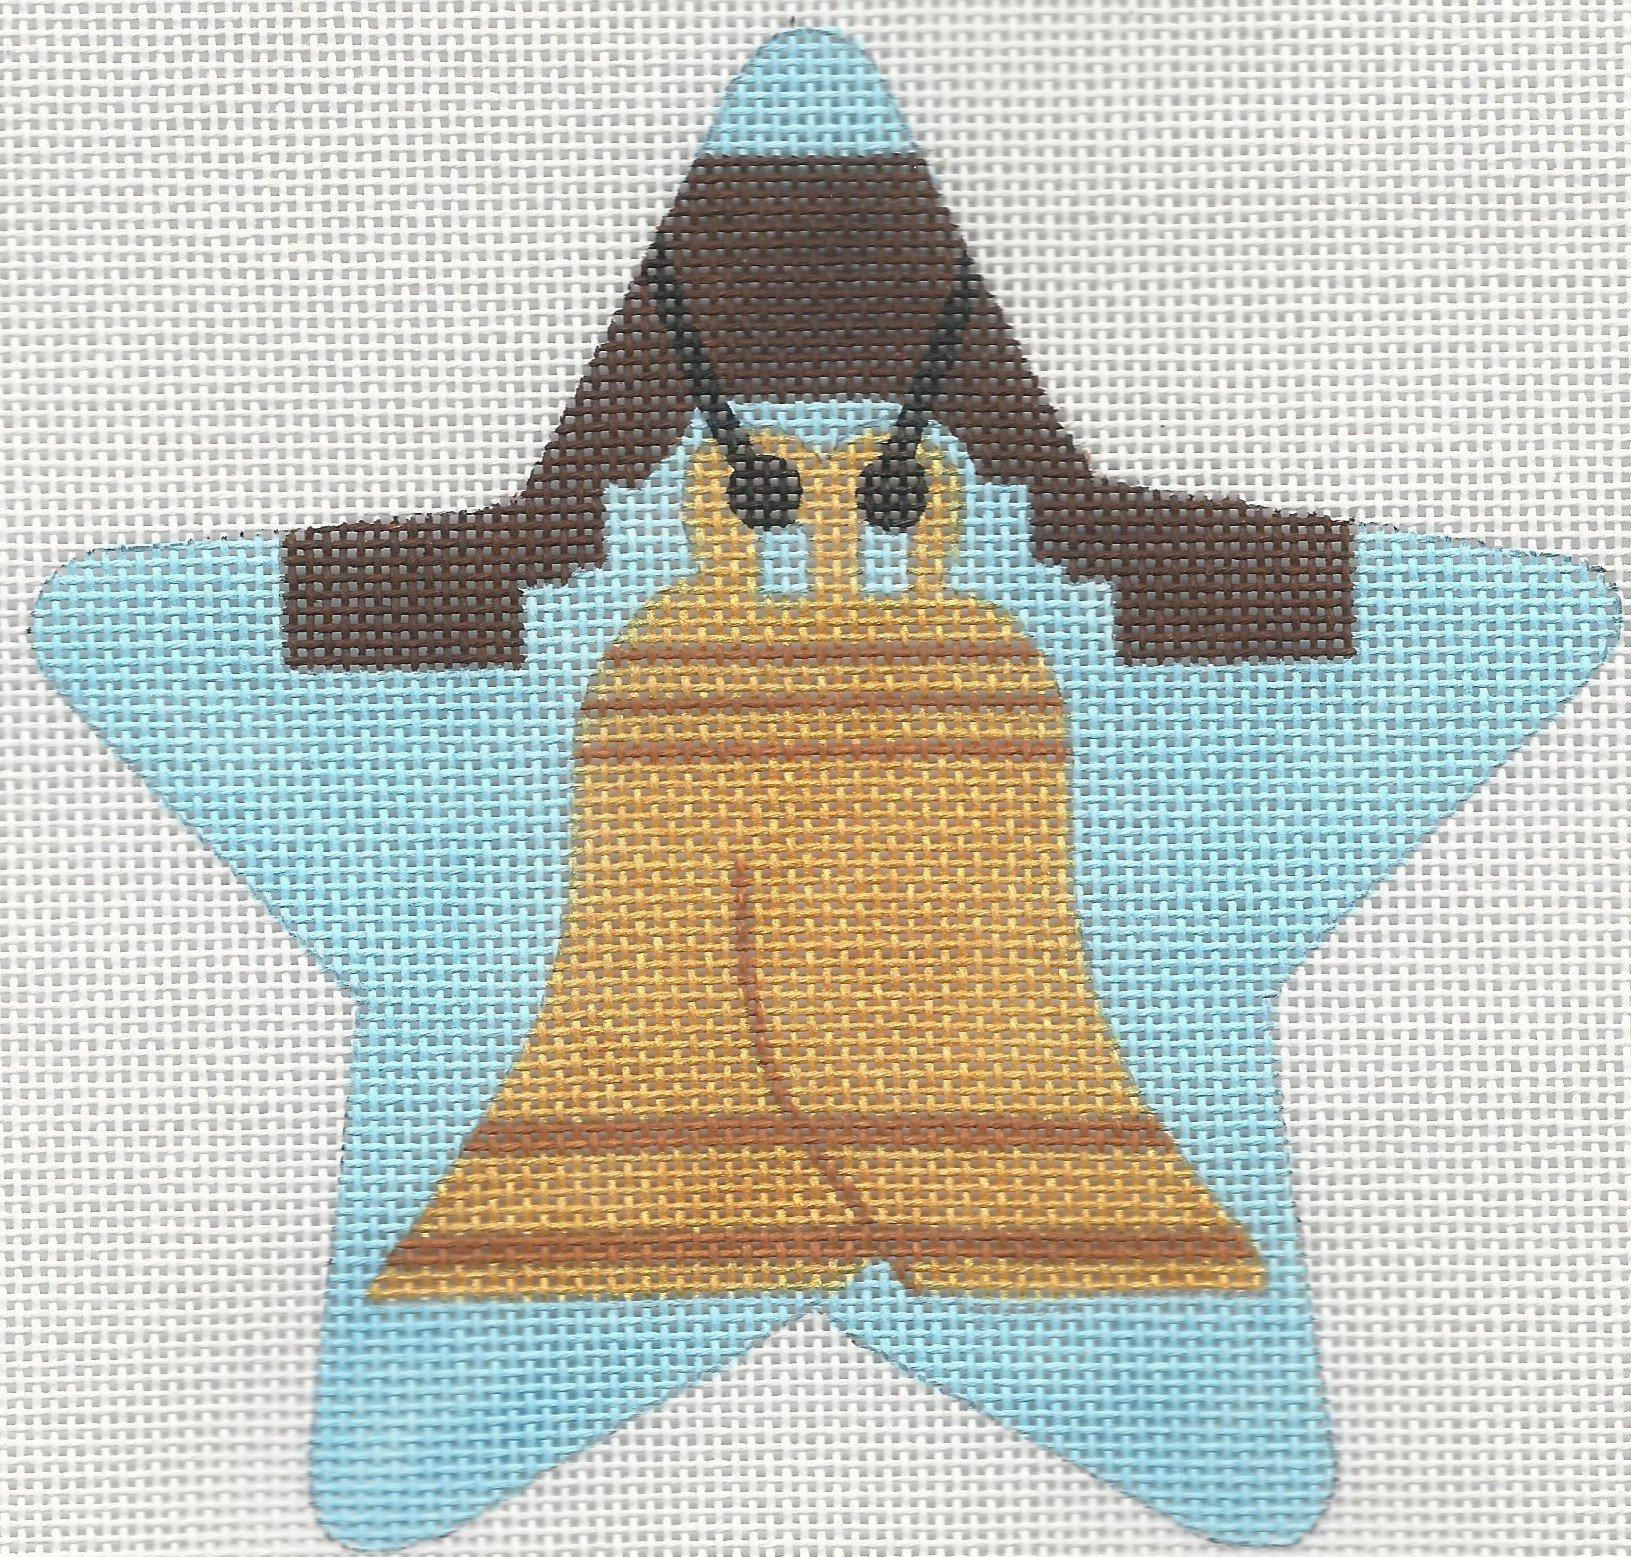 HO1400-LIBERTY BELL STAR